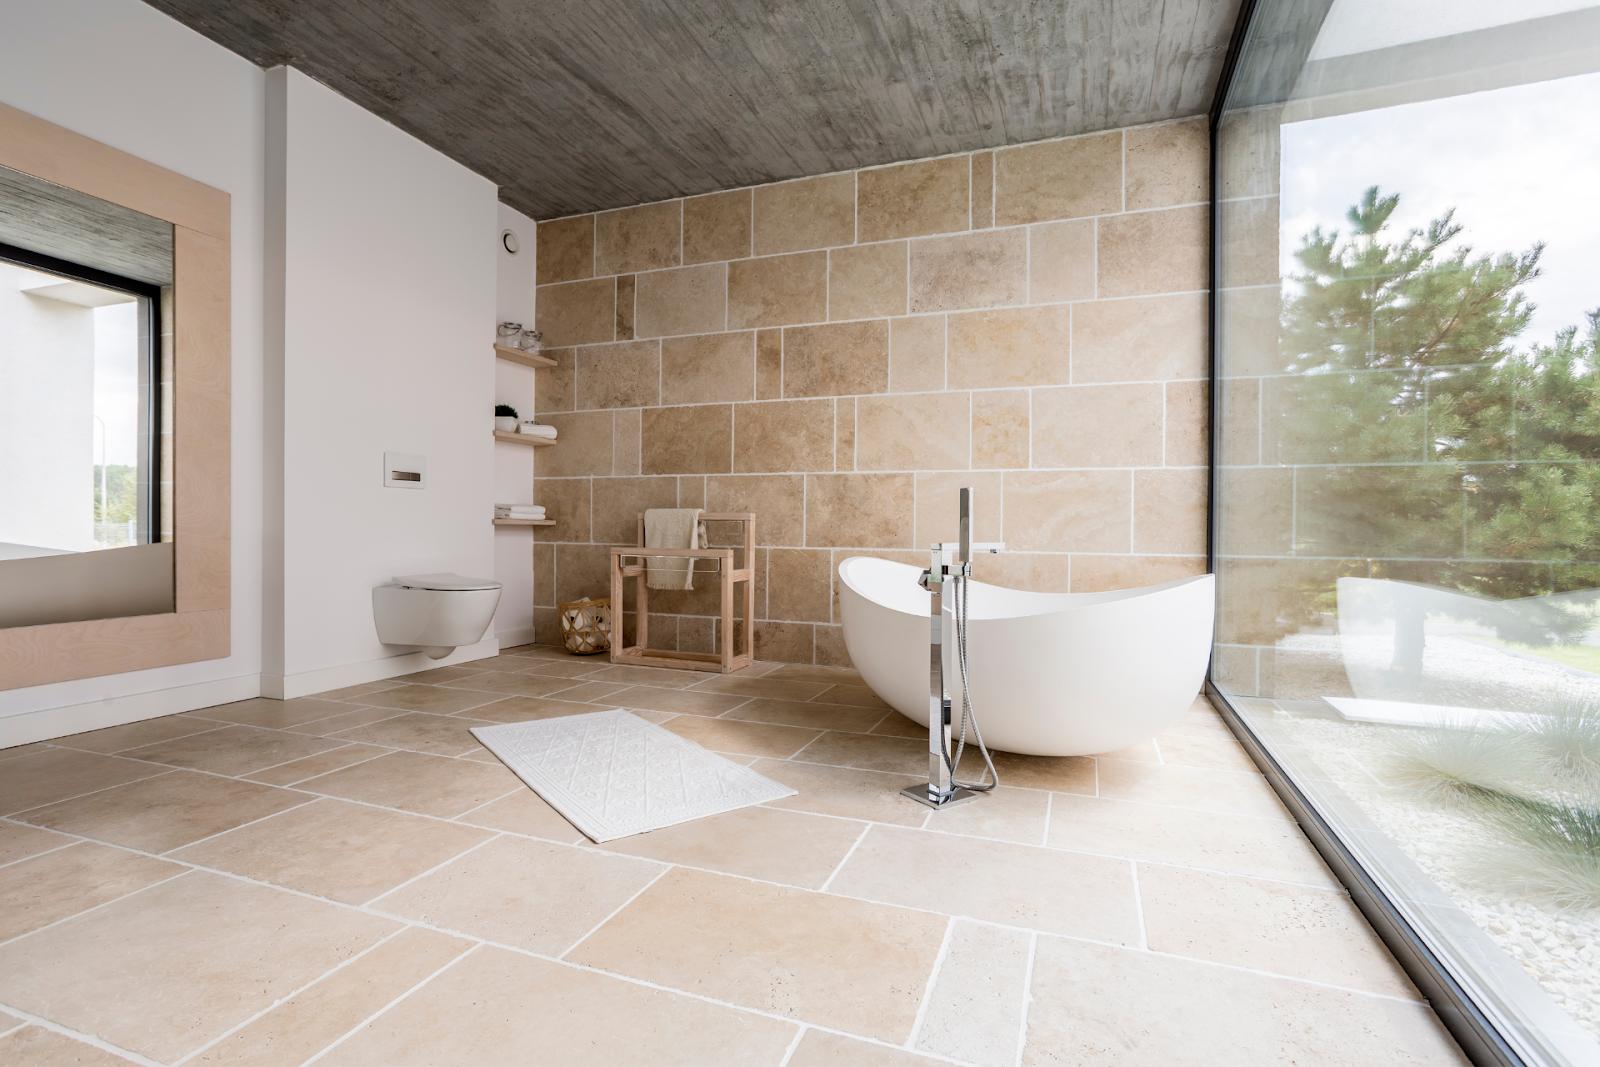 room in need of bathroom remodeling in pittsburgh